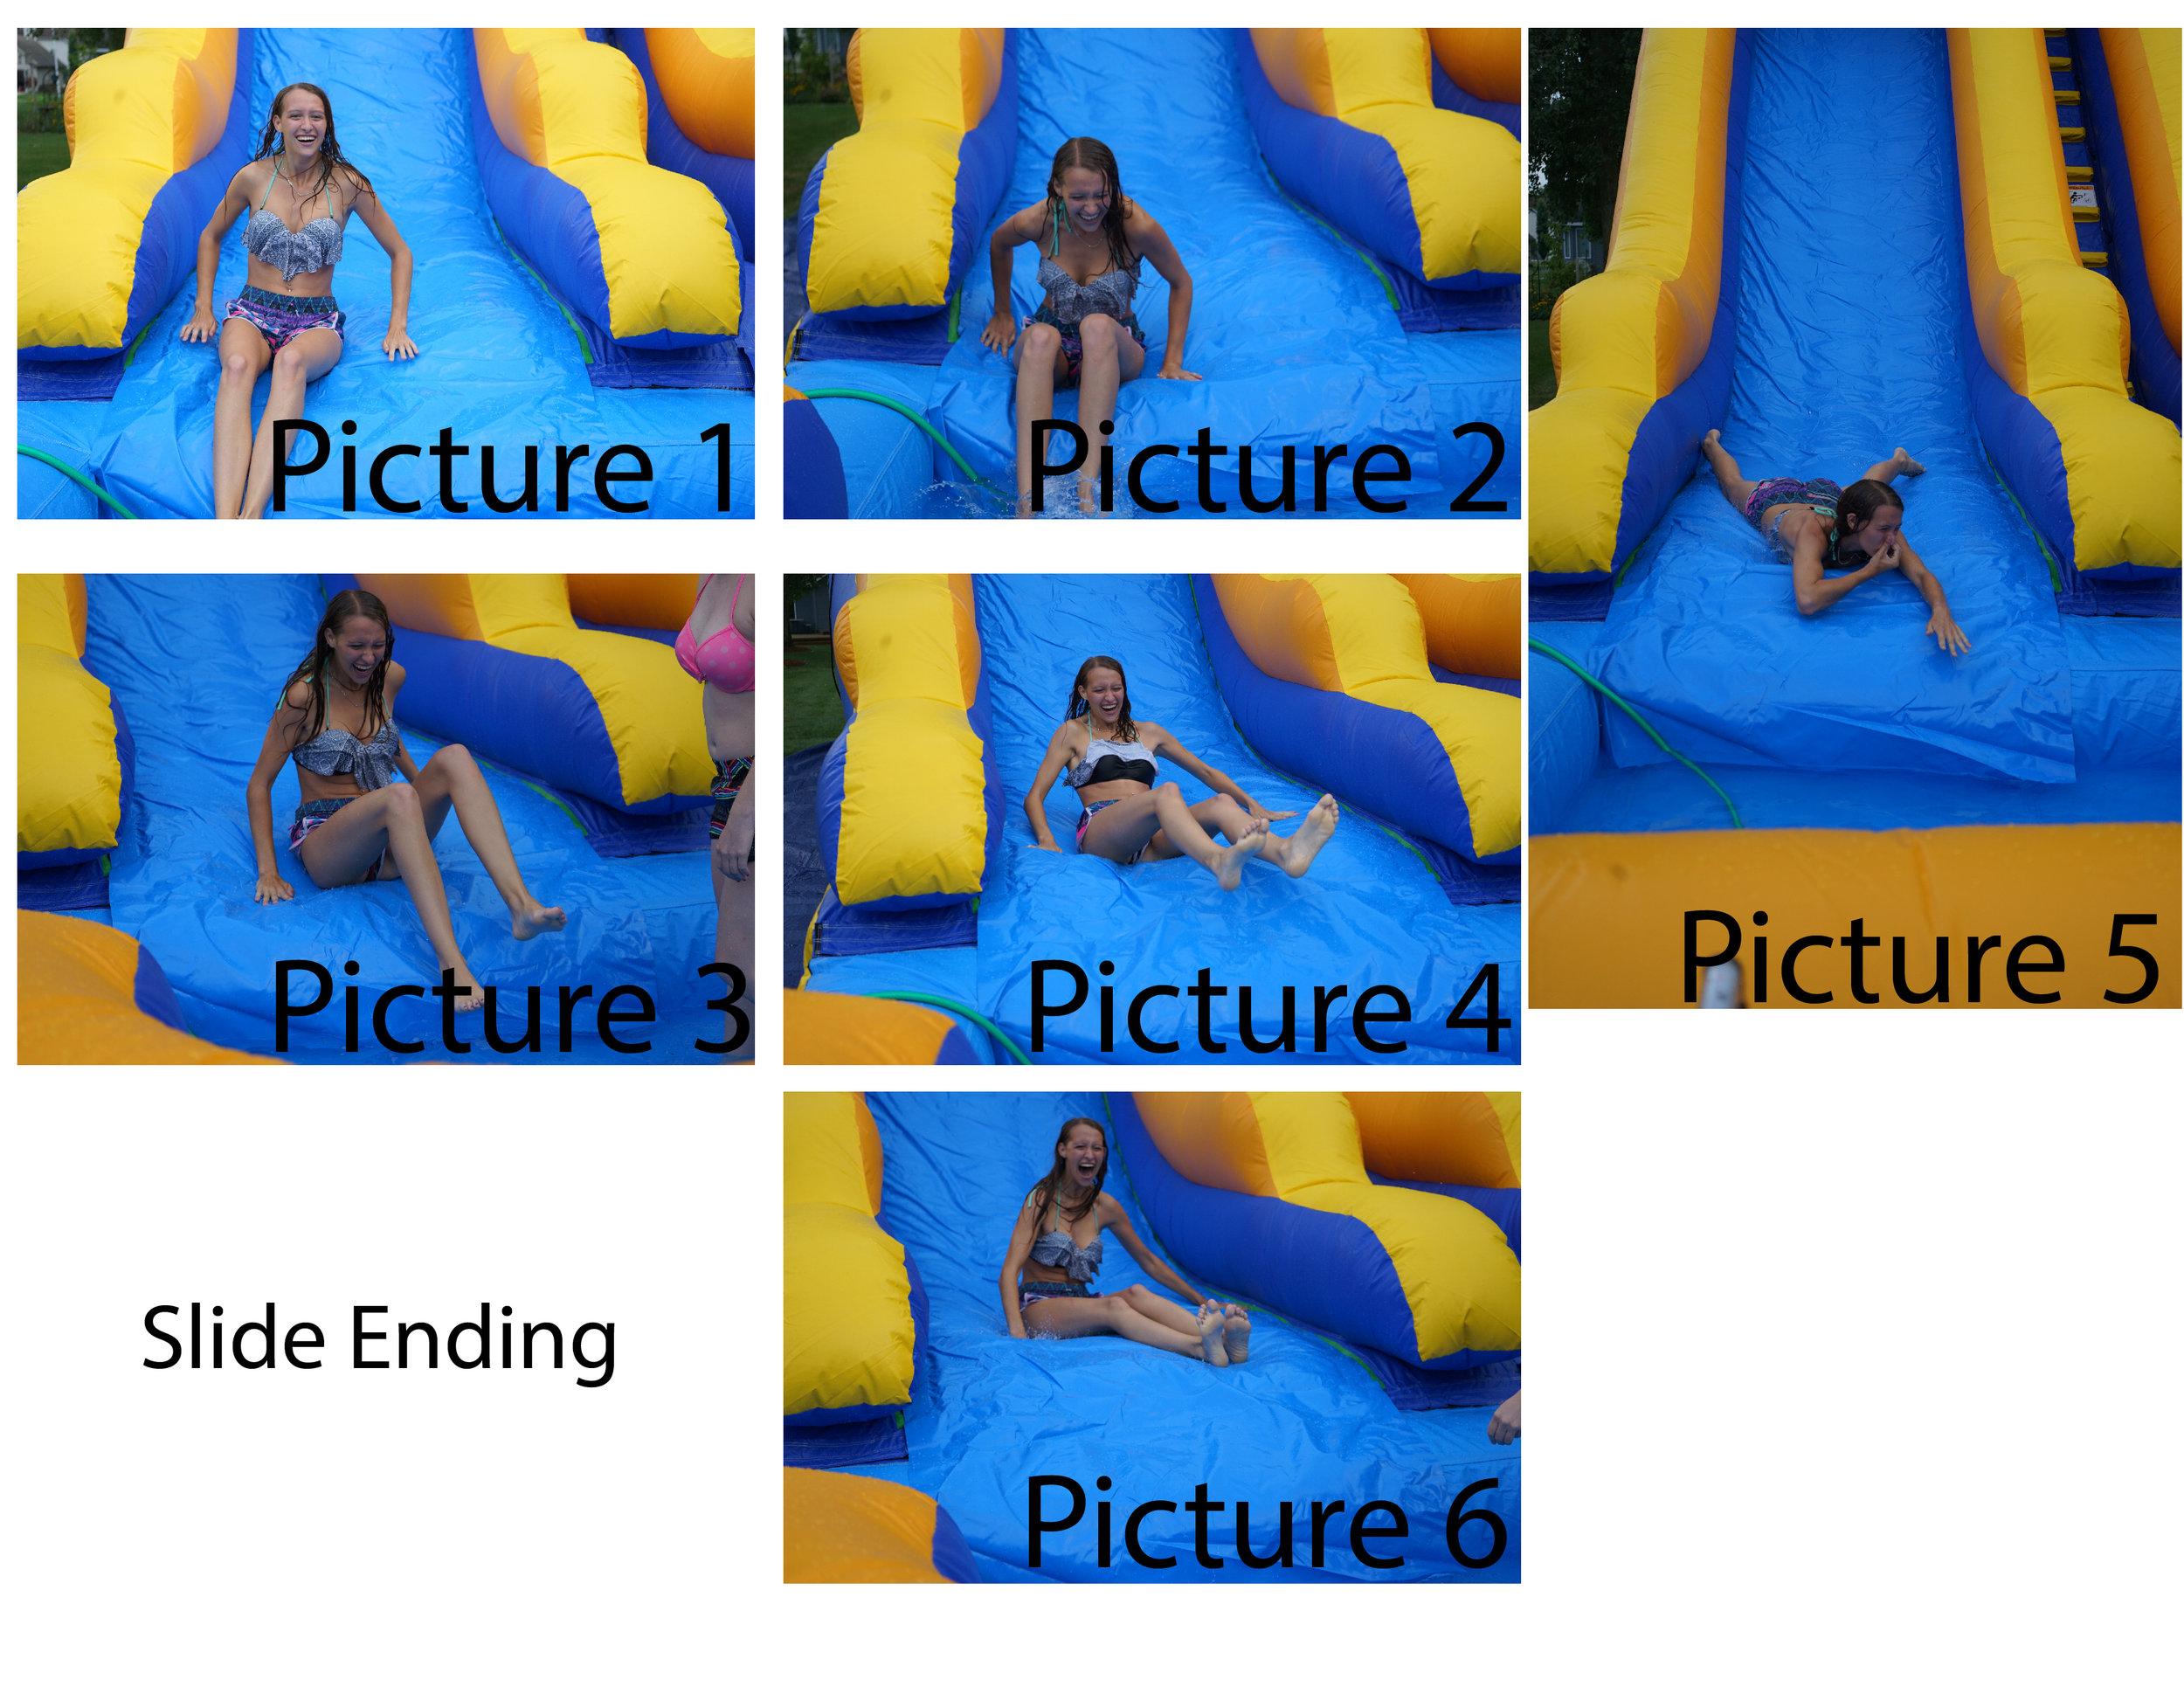 Slide Image Test-03.jpg